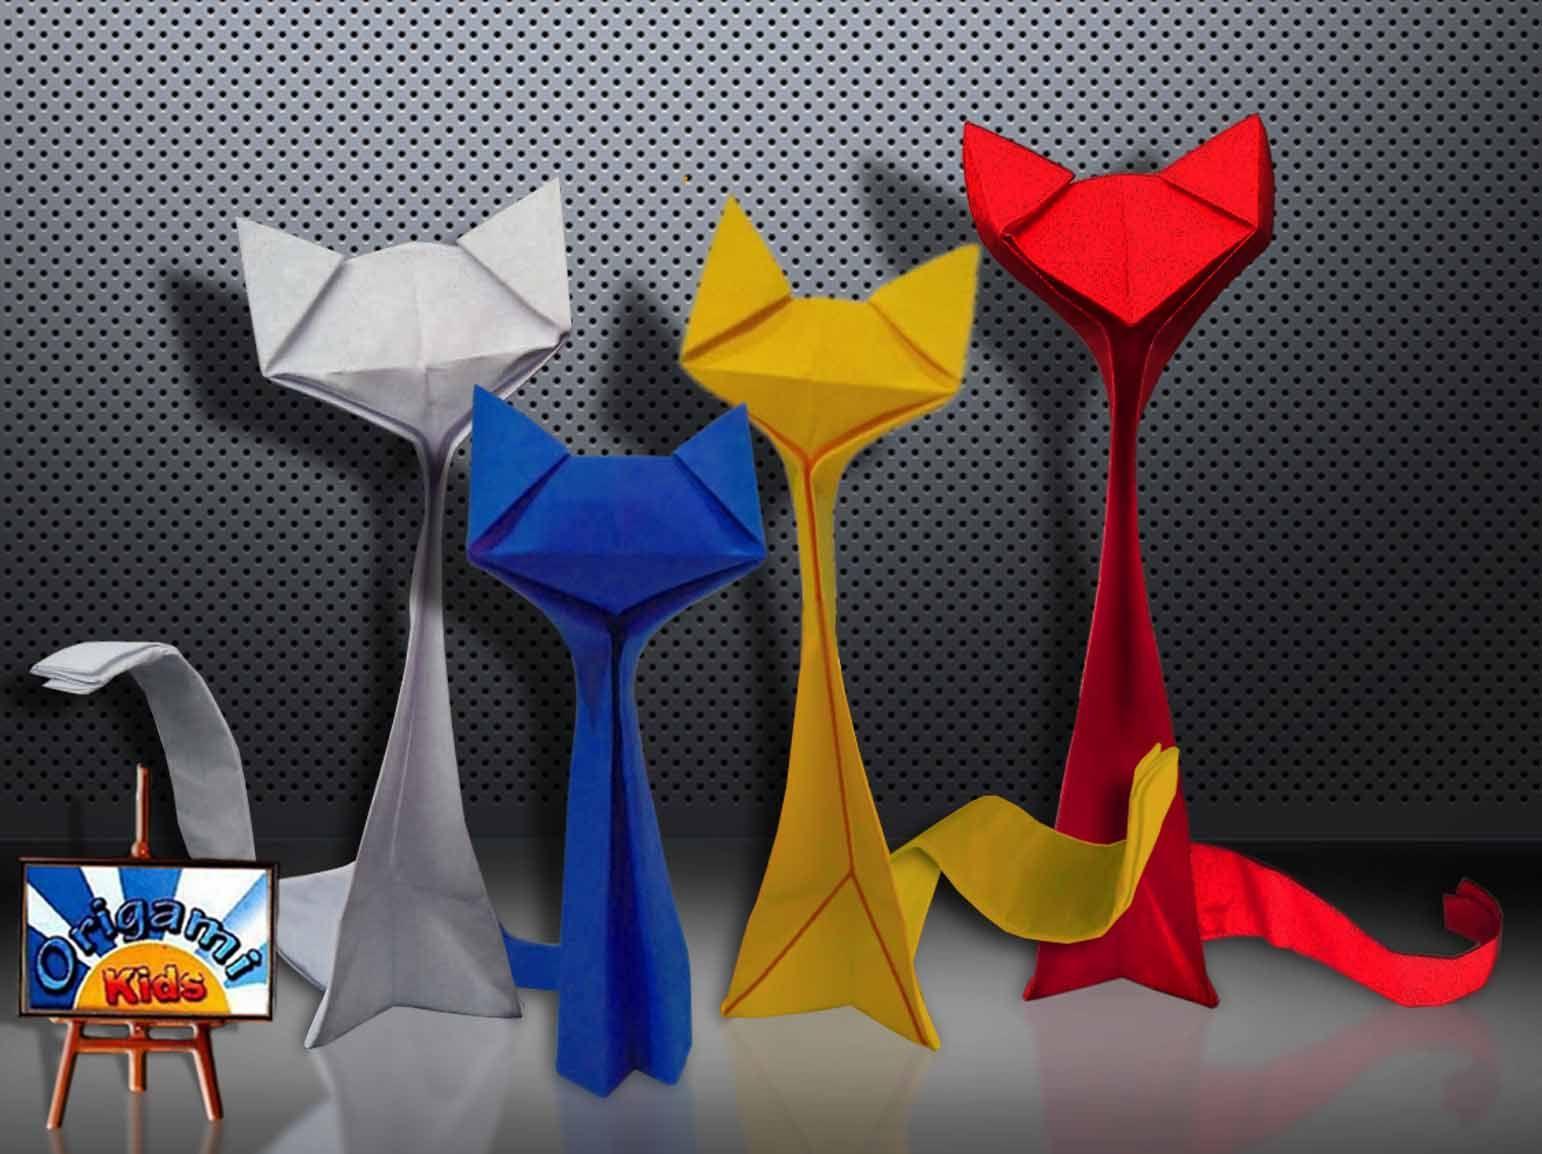 Origami Cat by Richard Wang Folder and Photo Origa MiKids